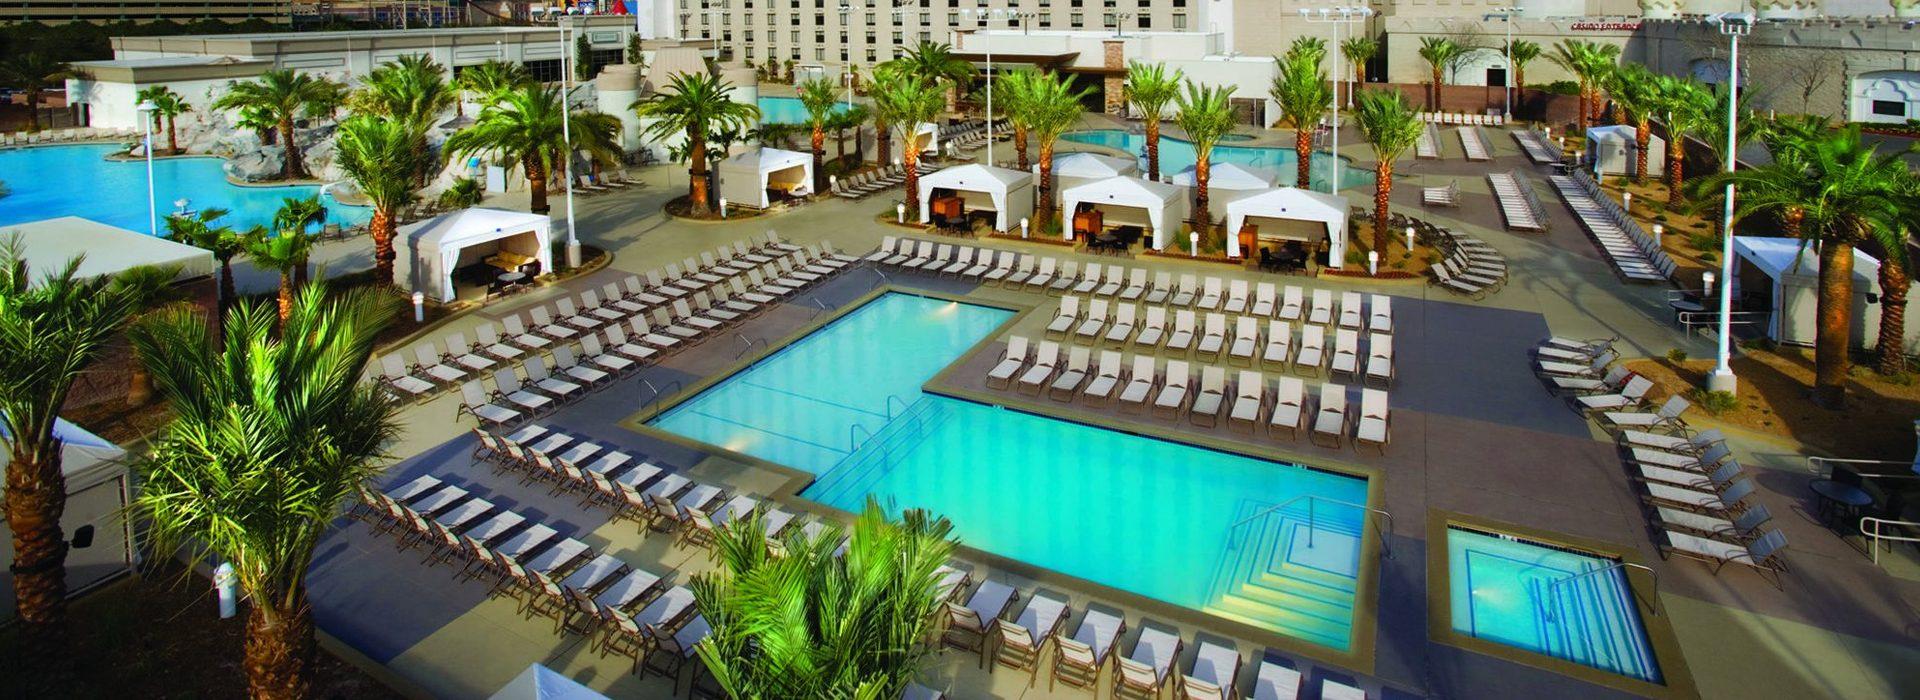 Room Rates For Excalibur Hotel In Las Vegas Nv